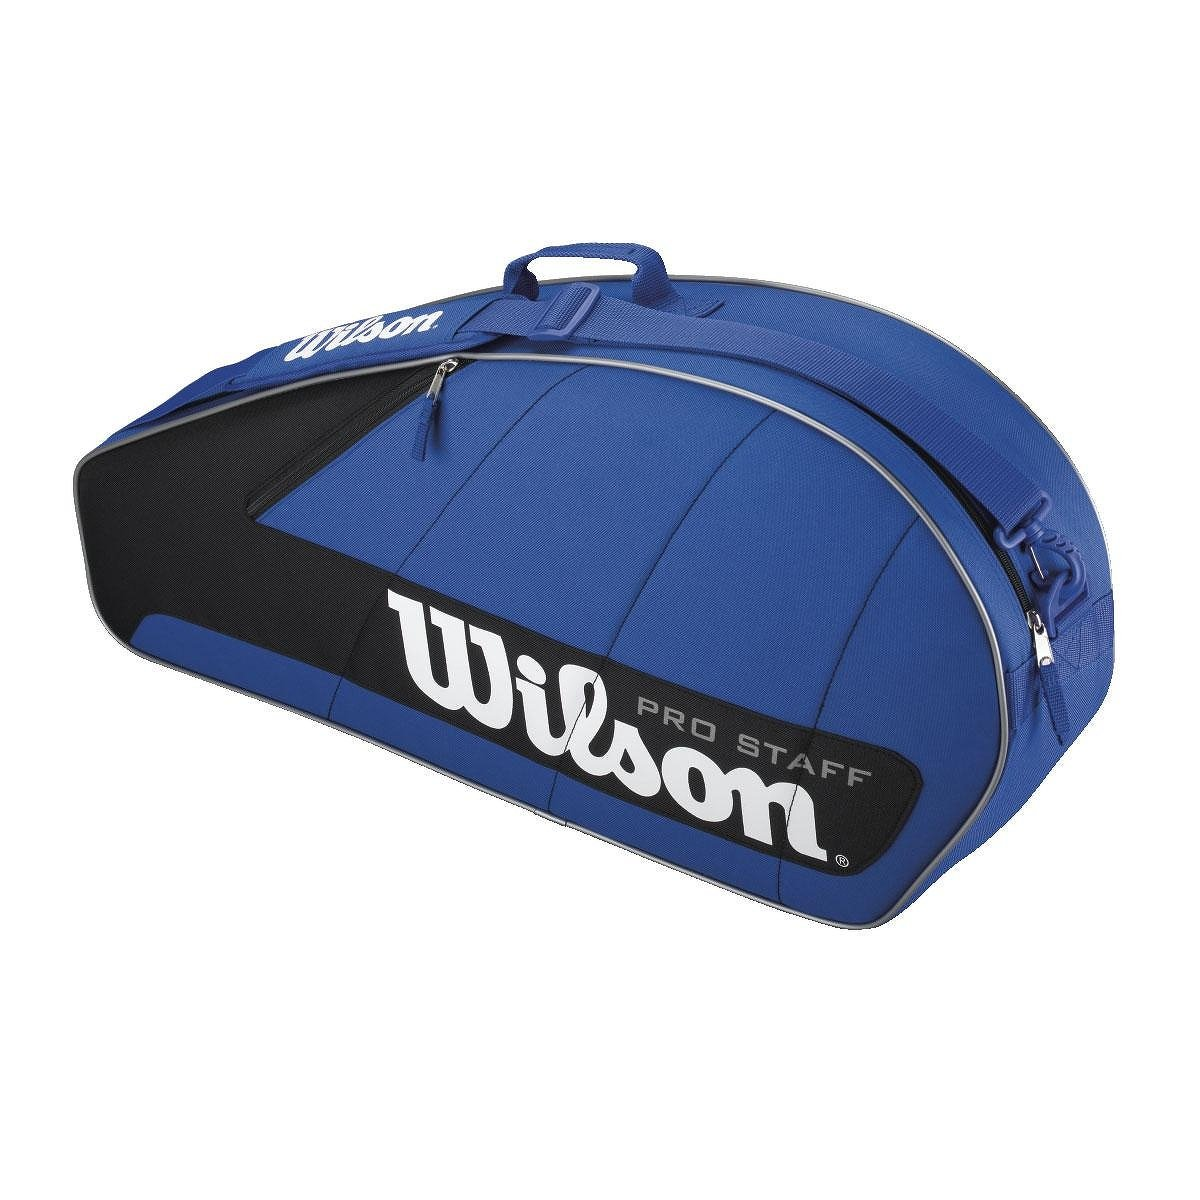 sacs de tennis - WILSON PRO STAFF3 S